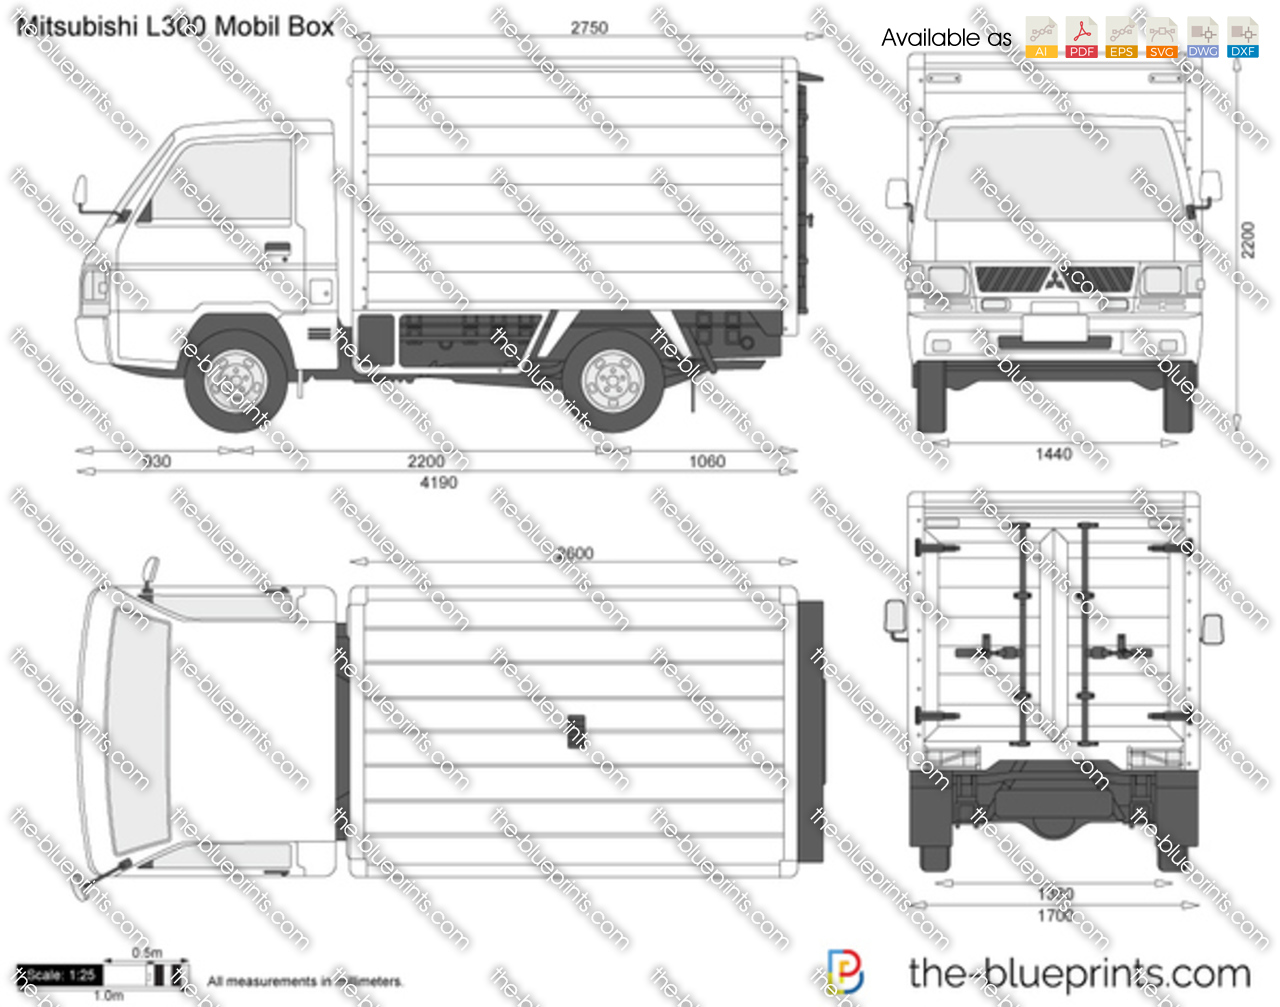 Mitsubishi L300 Mobil Box 1988